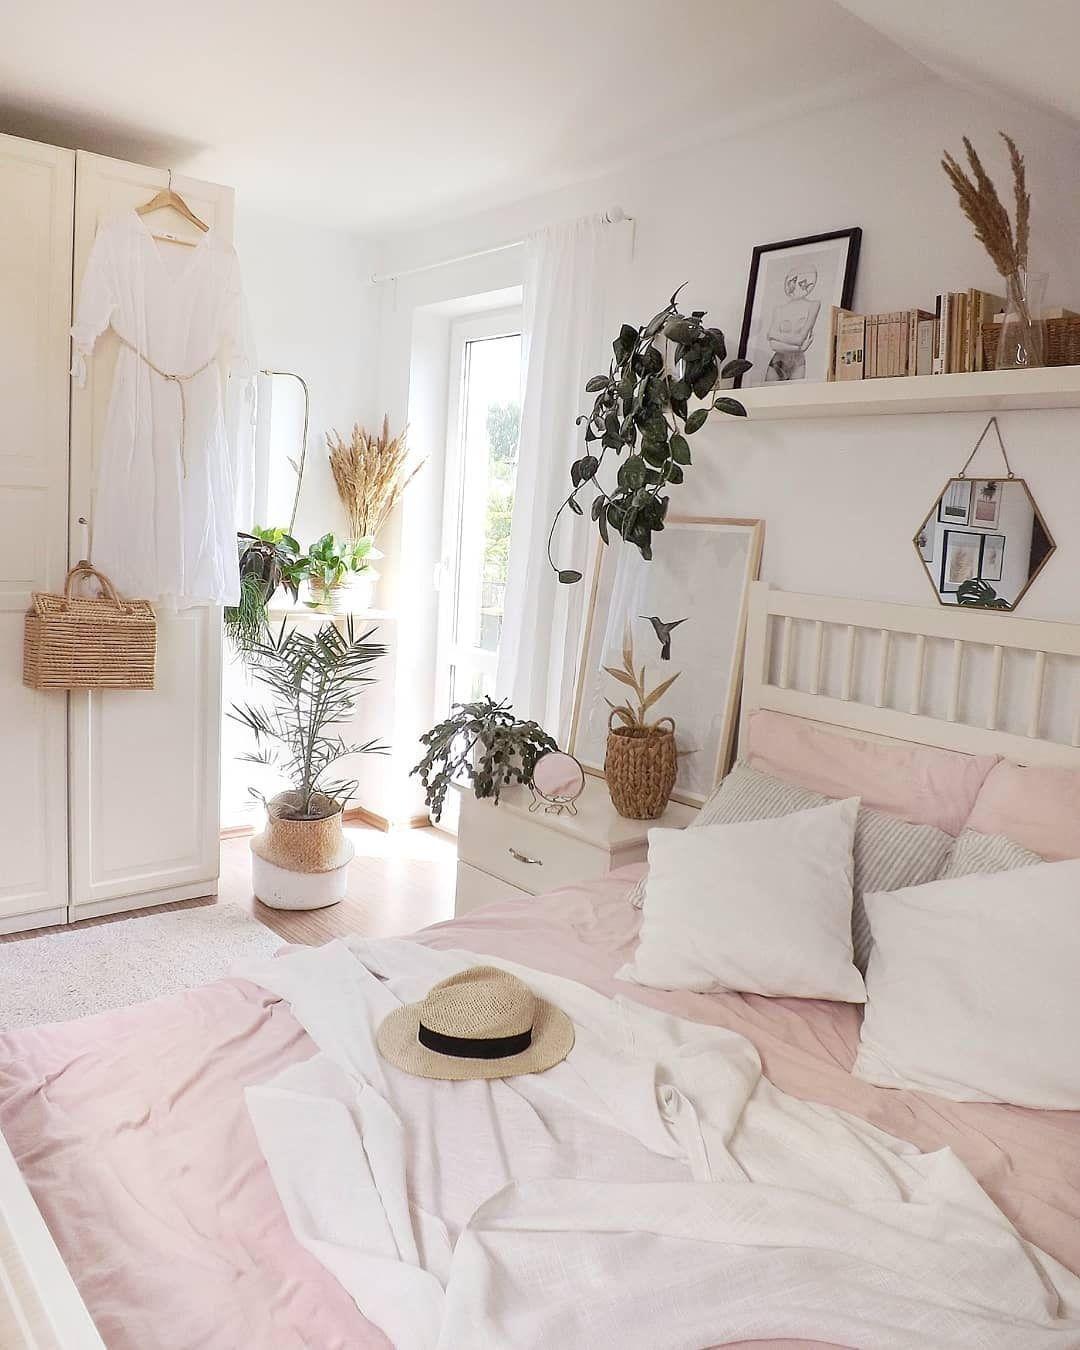 Room Decored Aesthetic White Roomdecor Dorm Roomspiration Room Inspiration Bedroom Bedroom Decor Simple Bedroom Bedroom design size 4x6